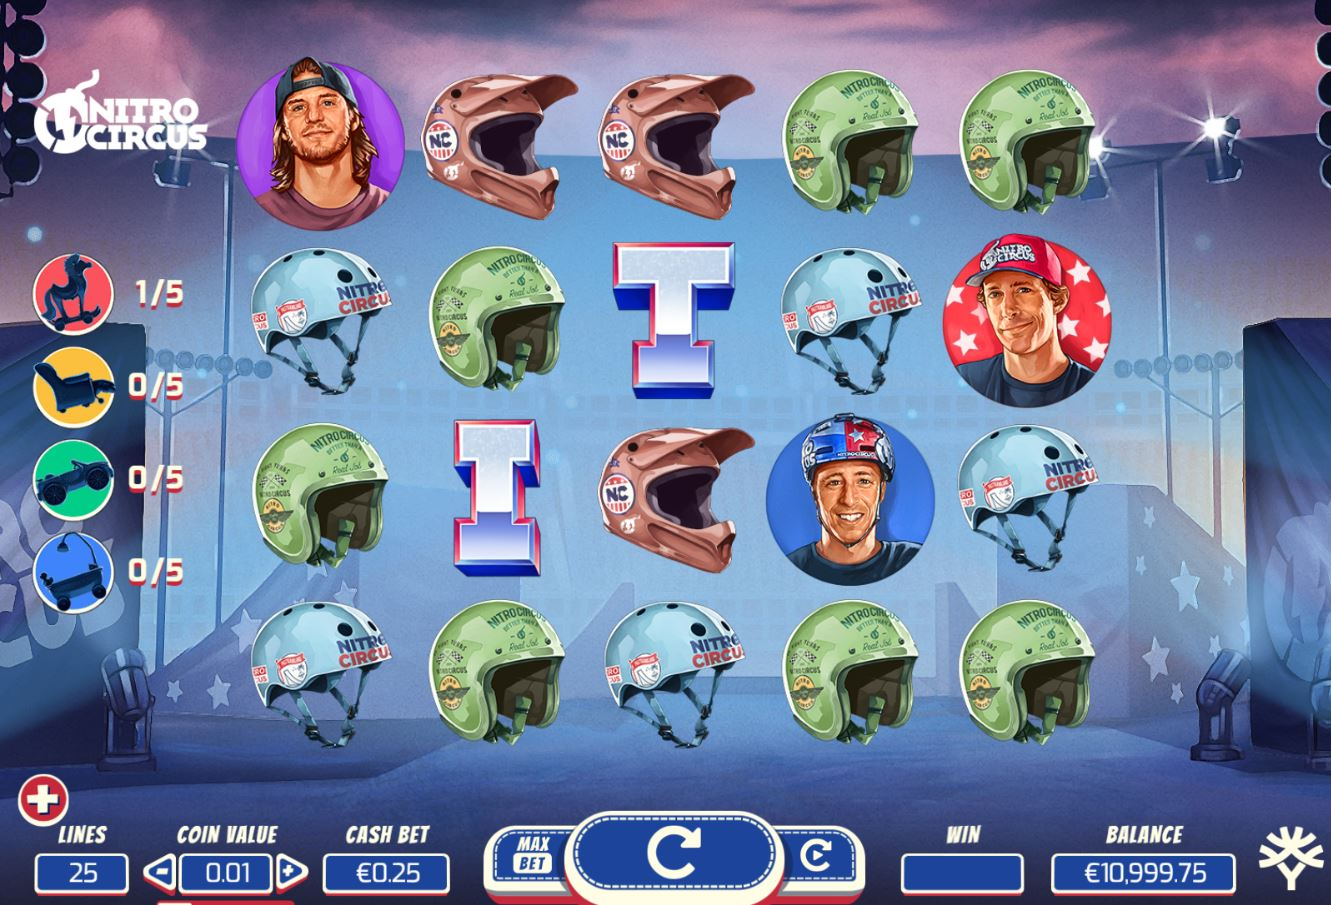 Nitro Circus Video Game